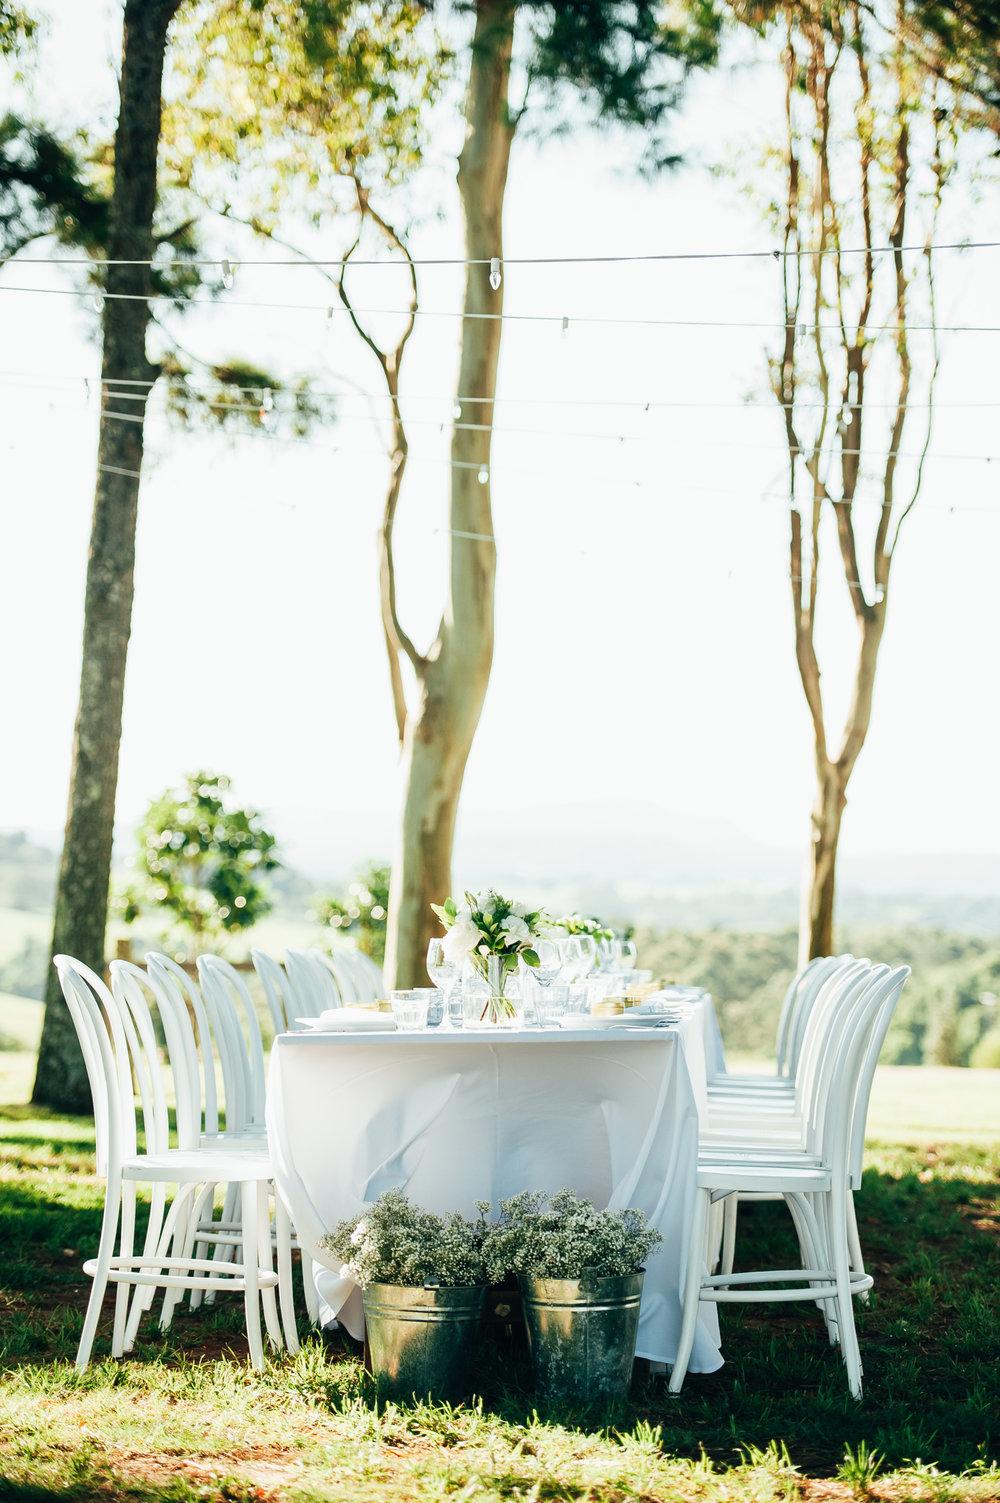 Byron_View_Wedding_Venue-37.jpg